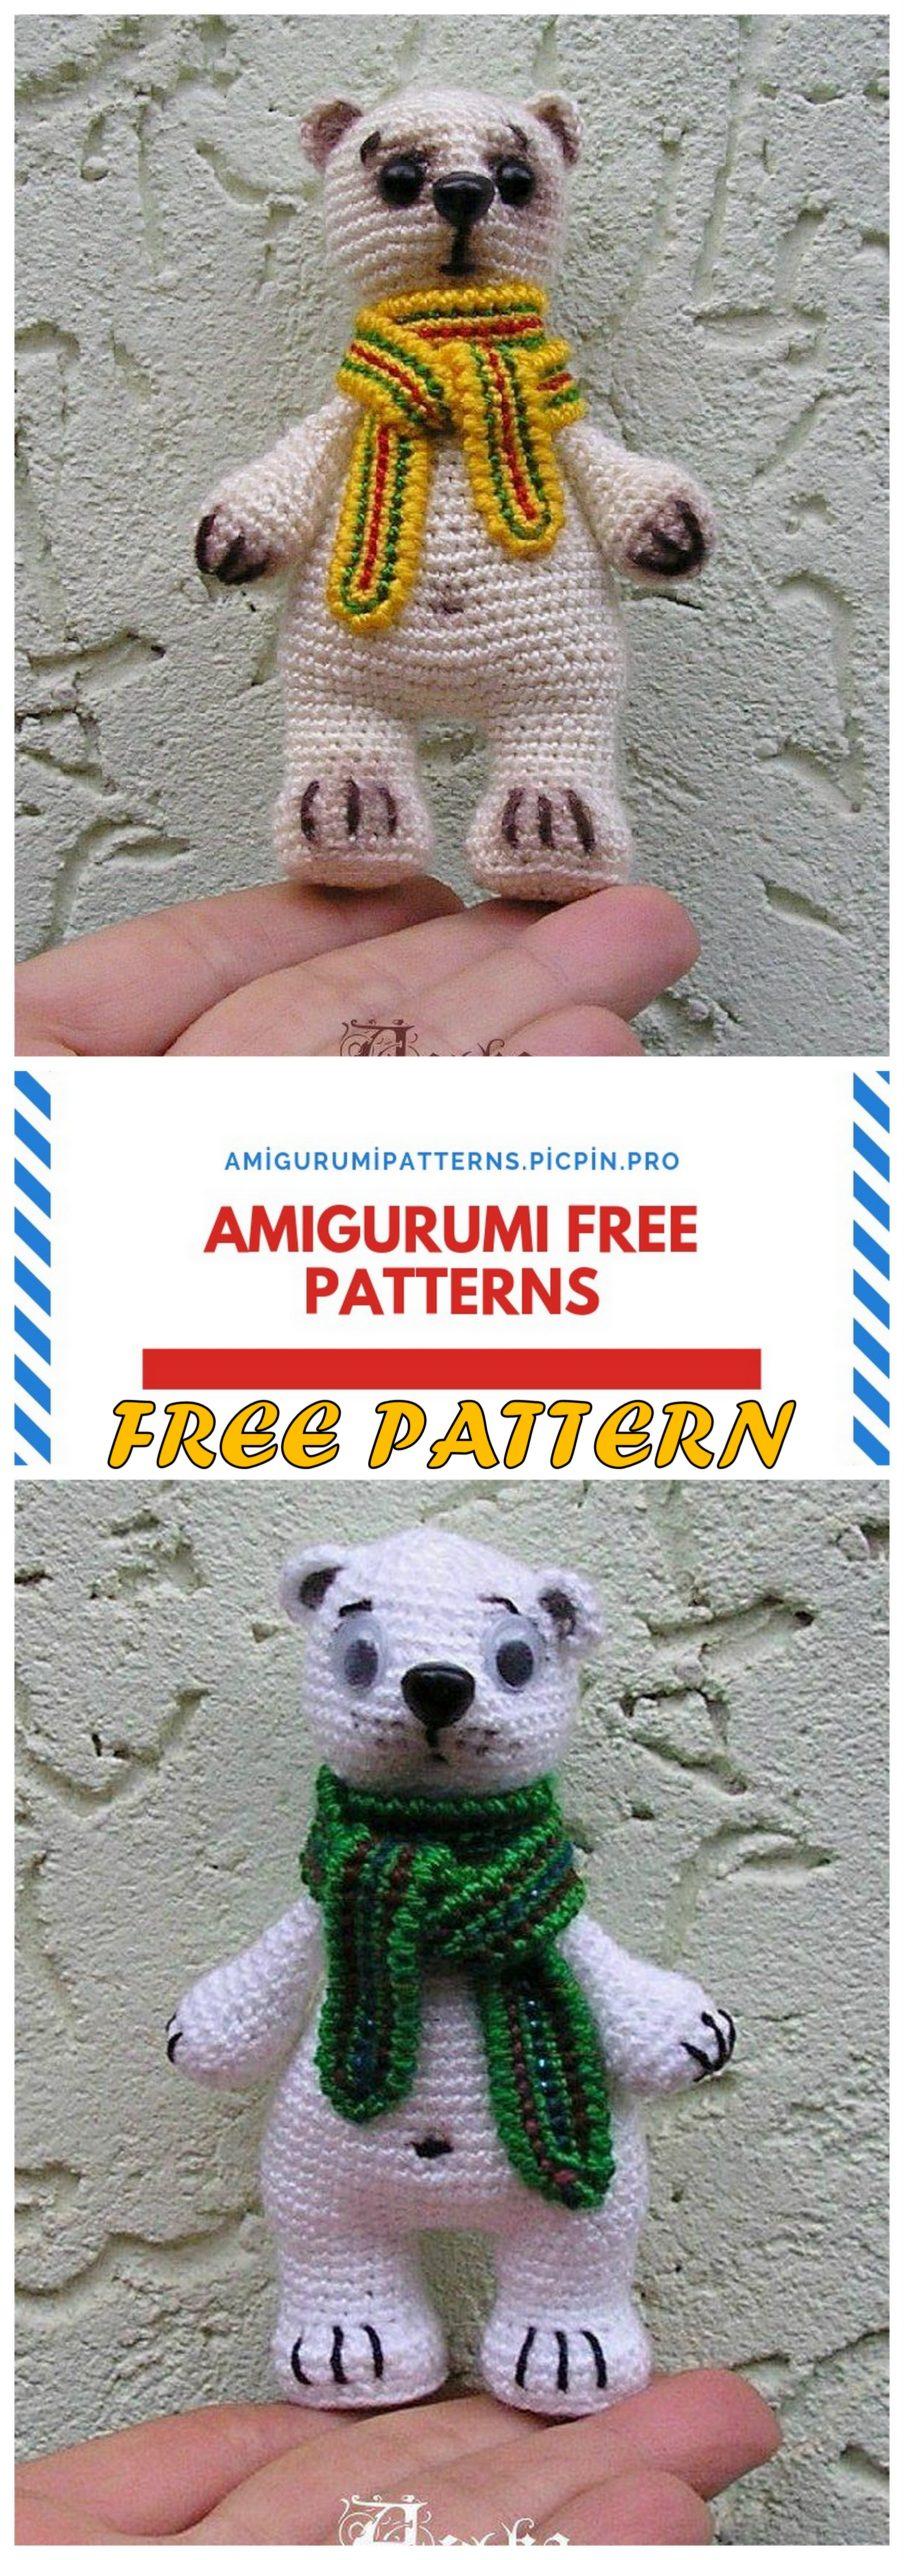 CROCHET BEAR arşivleri - Amigurumi Free Pattern Shares | 2560x904